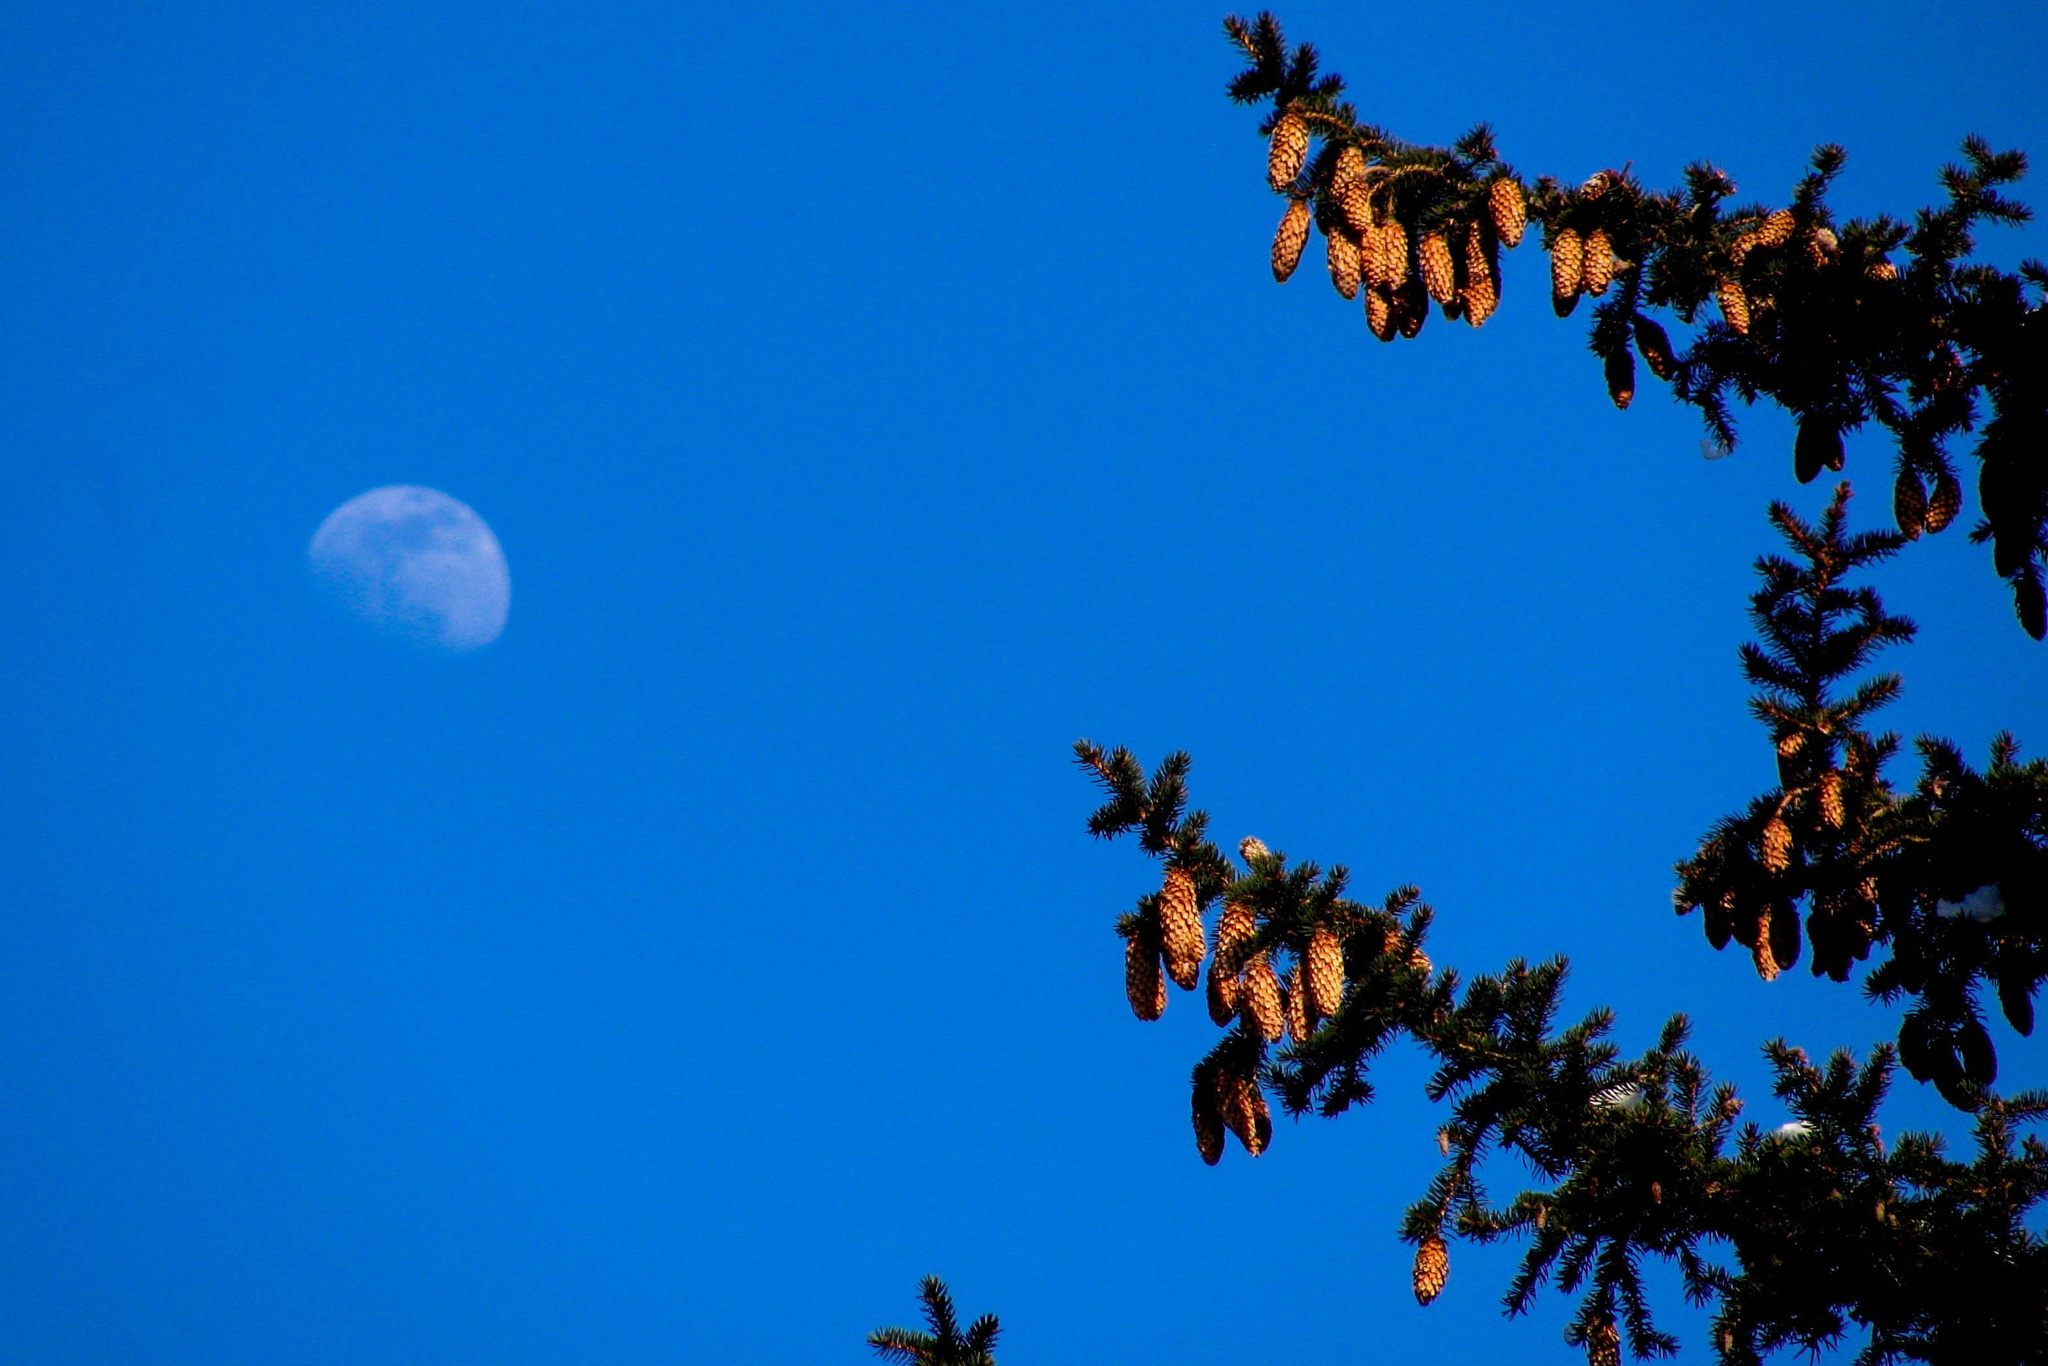 Winter Moon by Mark Hootman